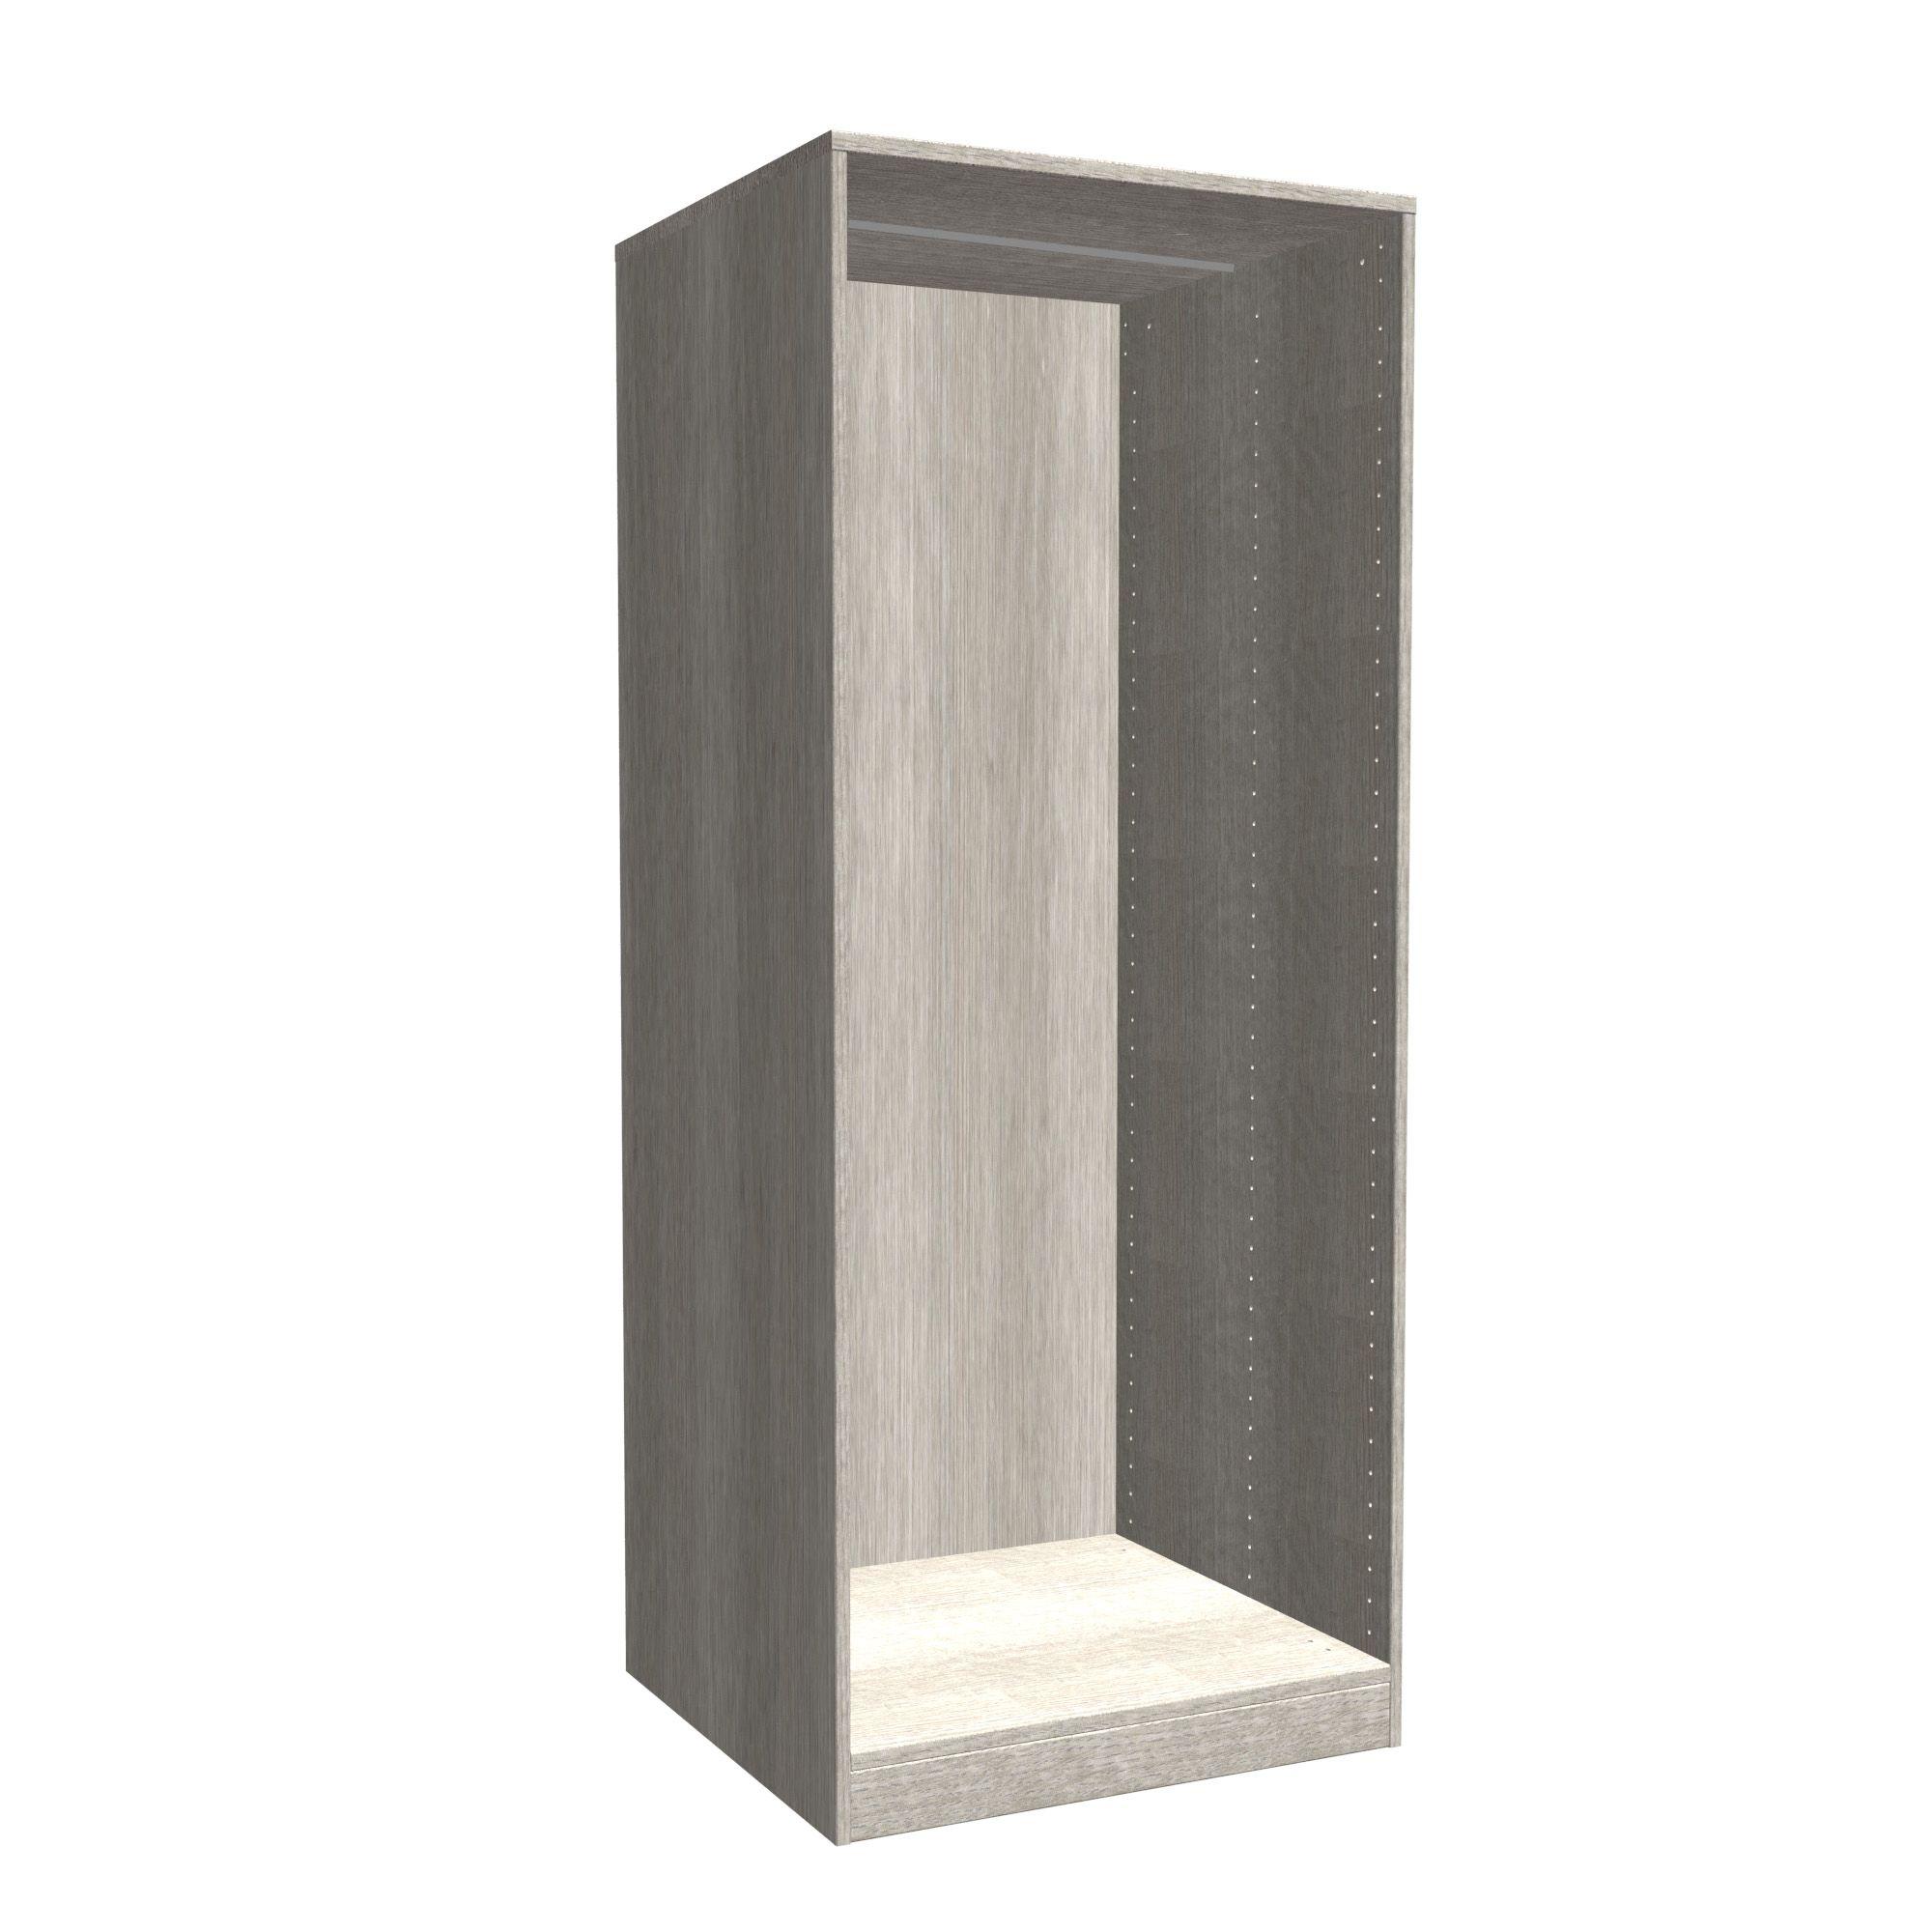 Darwin Modular Grey Oak Effect Large Chest Cabinet (h)1506mm (w)500mm (d)566mm